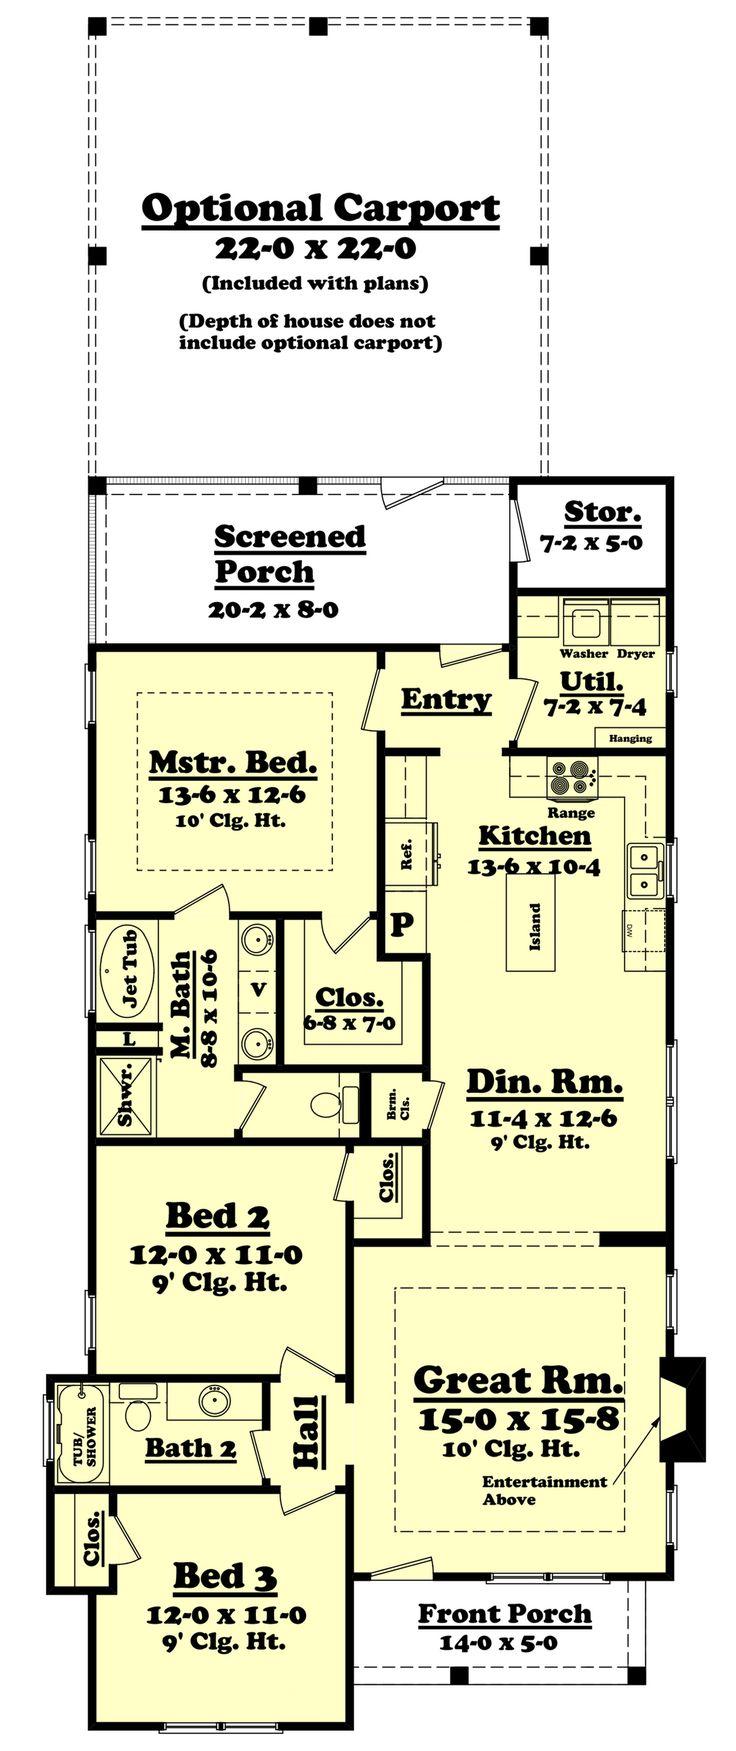 15 best floor plans images on pinterest garages house floor cottage style house plan 3 beds 2 baths 1396 sq ft plan 430